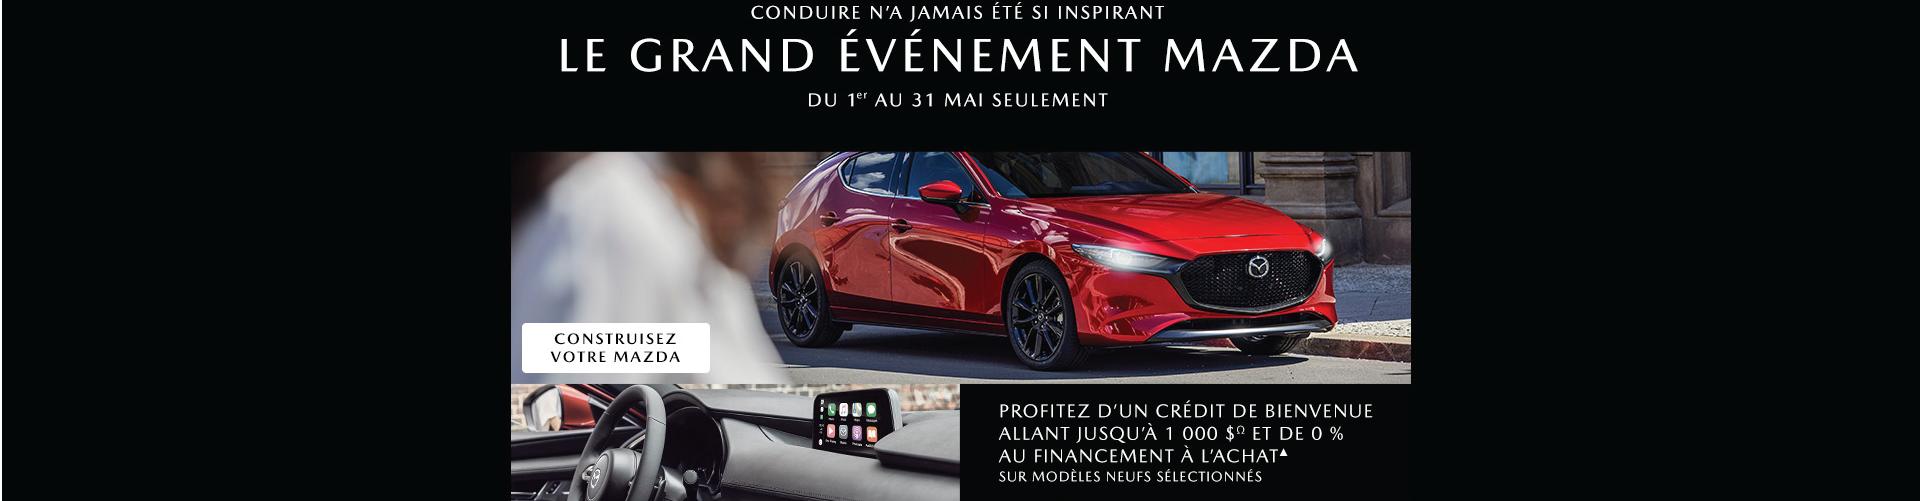 The Ultimate Mazda Event